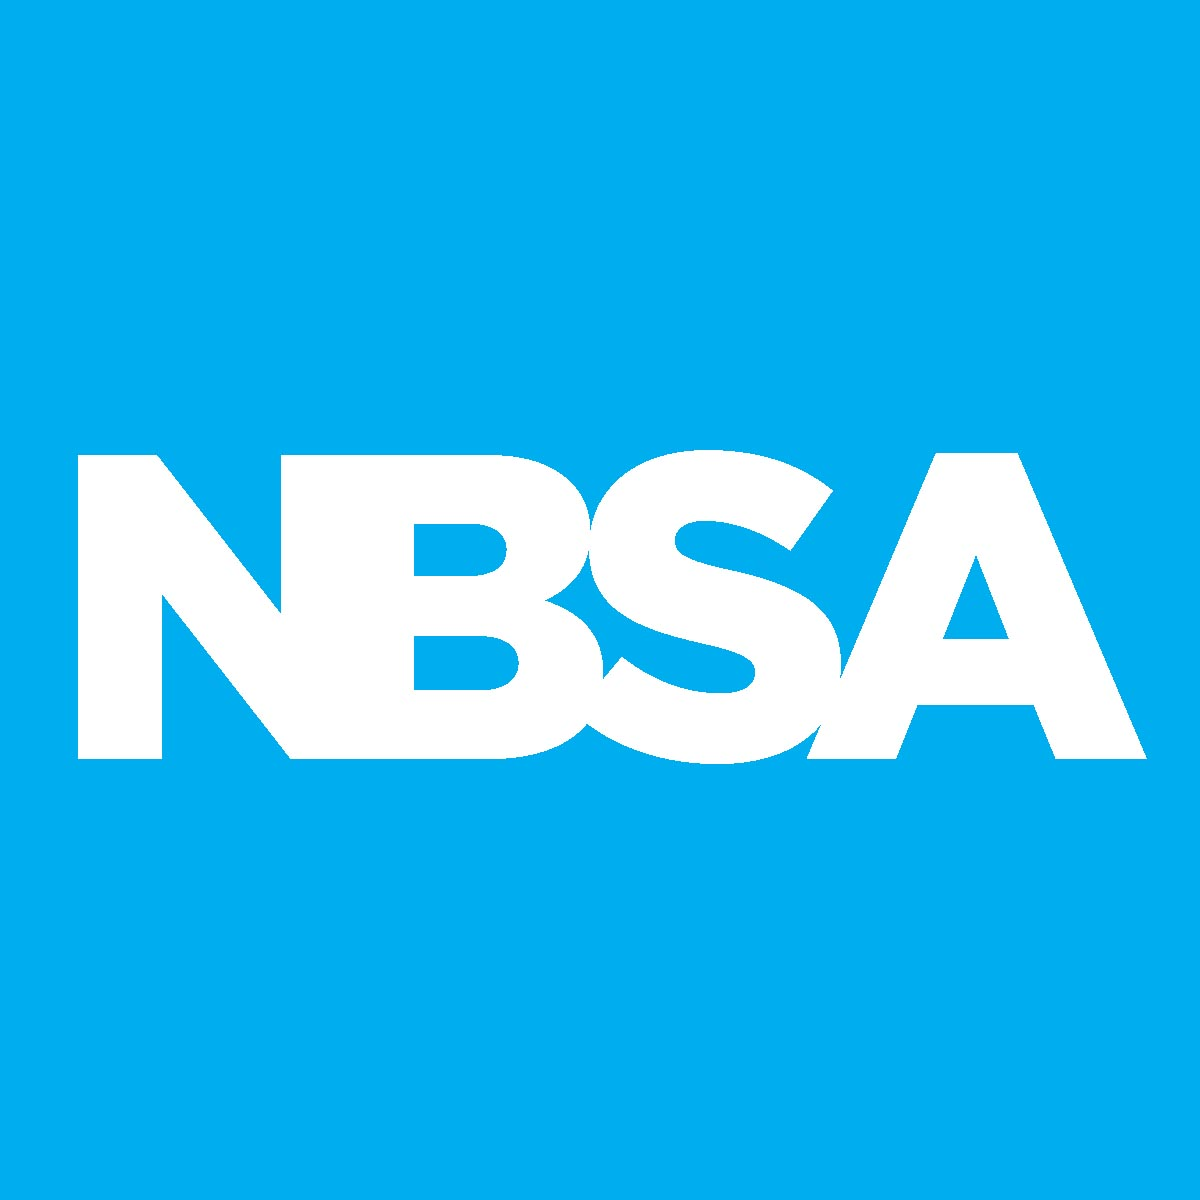 NBSA LOGO1.jpg